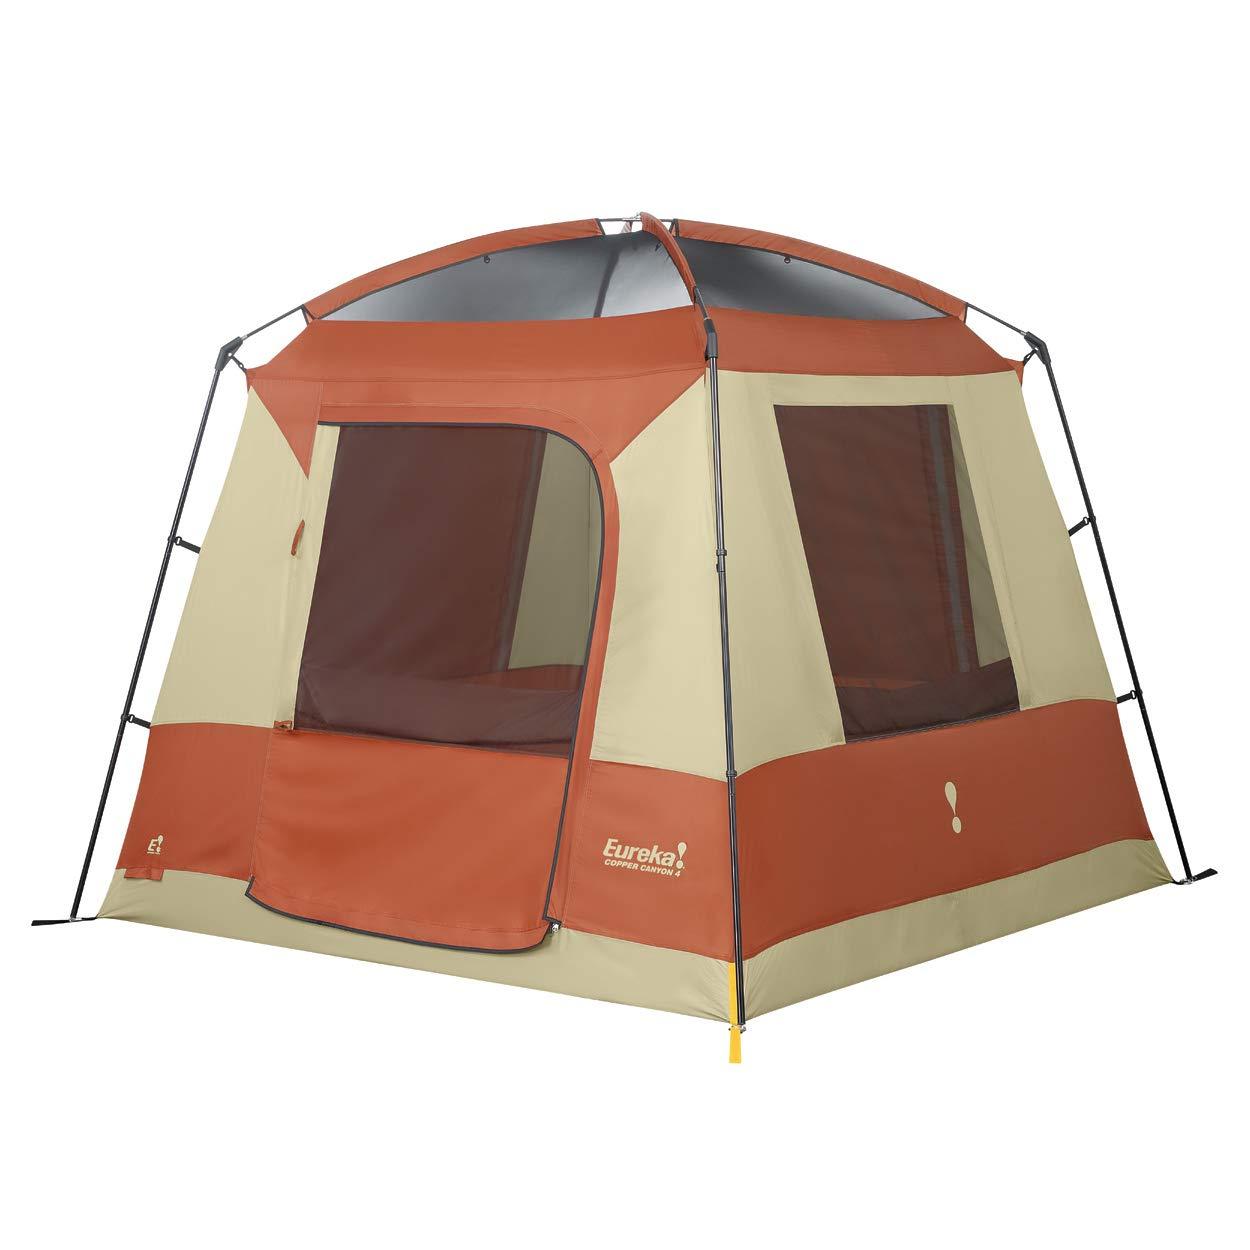 Eureka Copper Canyon 4-Person Tent